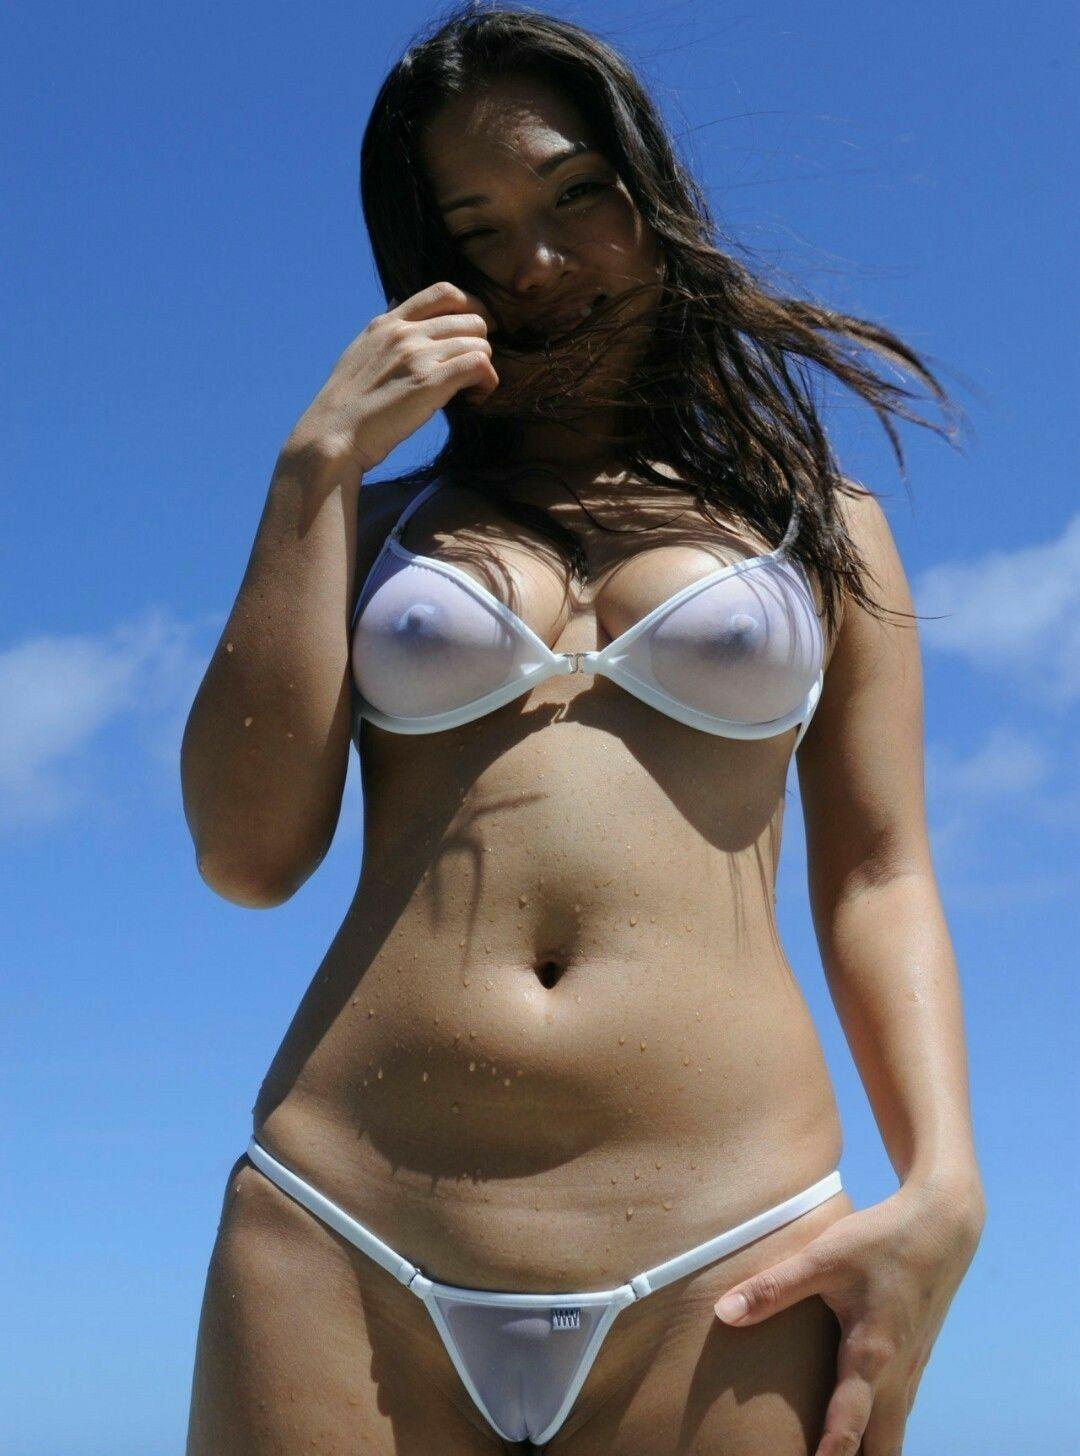 Hot Anni 80 Cameltoe Babe | Hot Girl HD Wallpaper